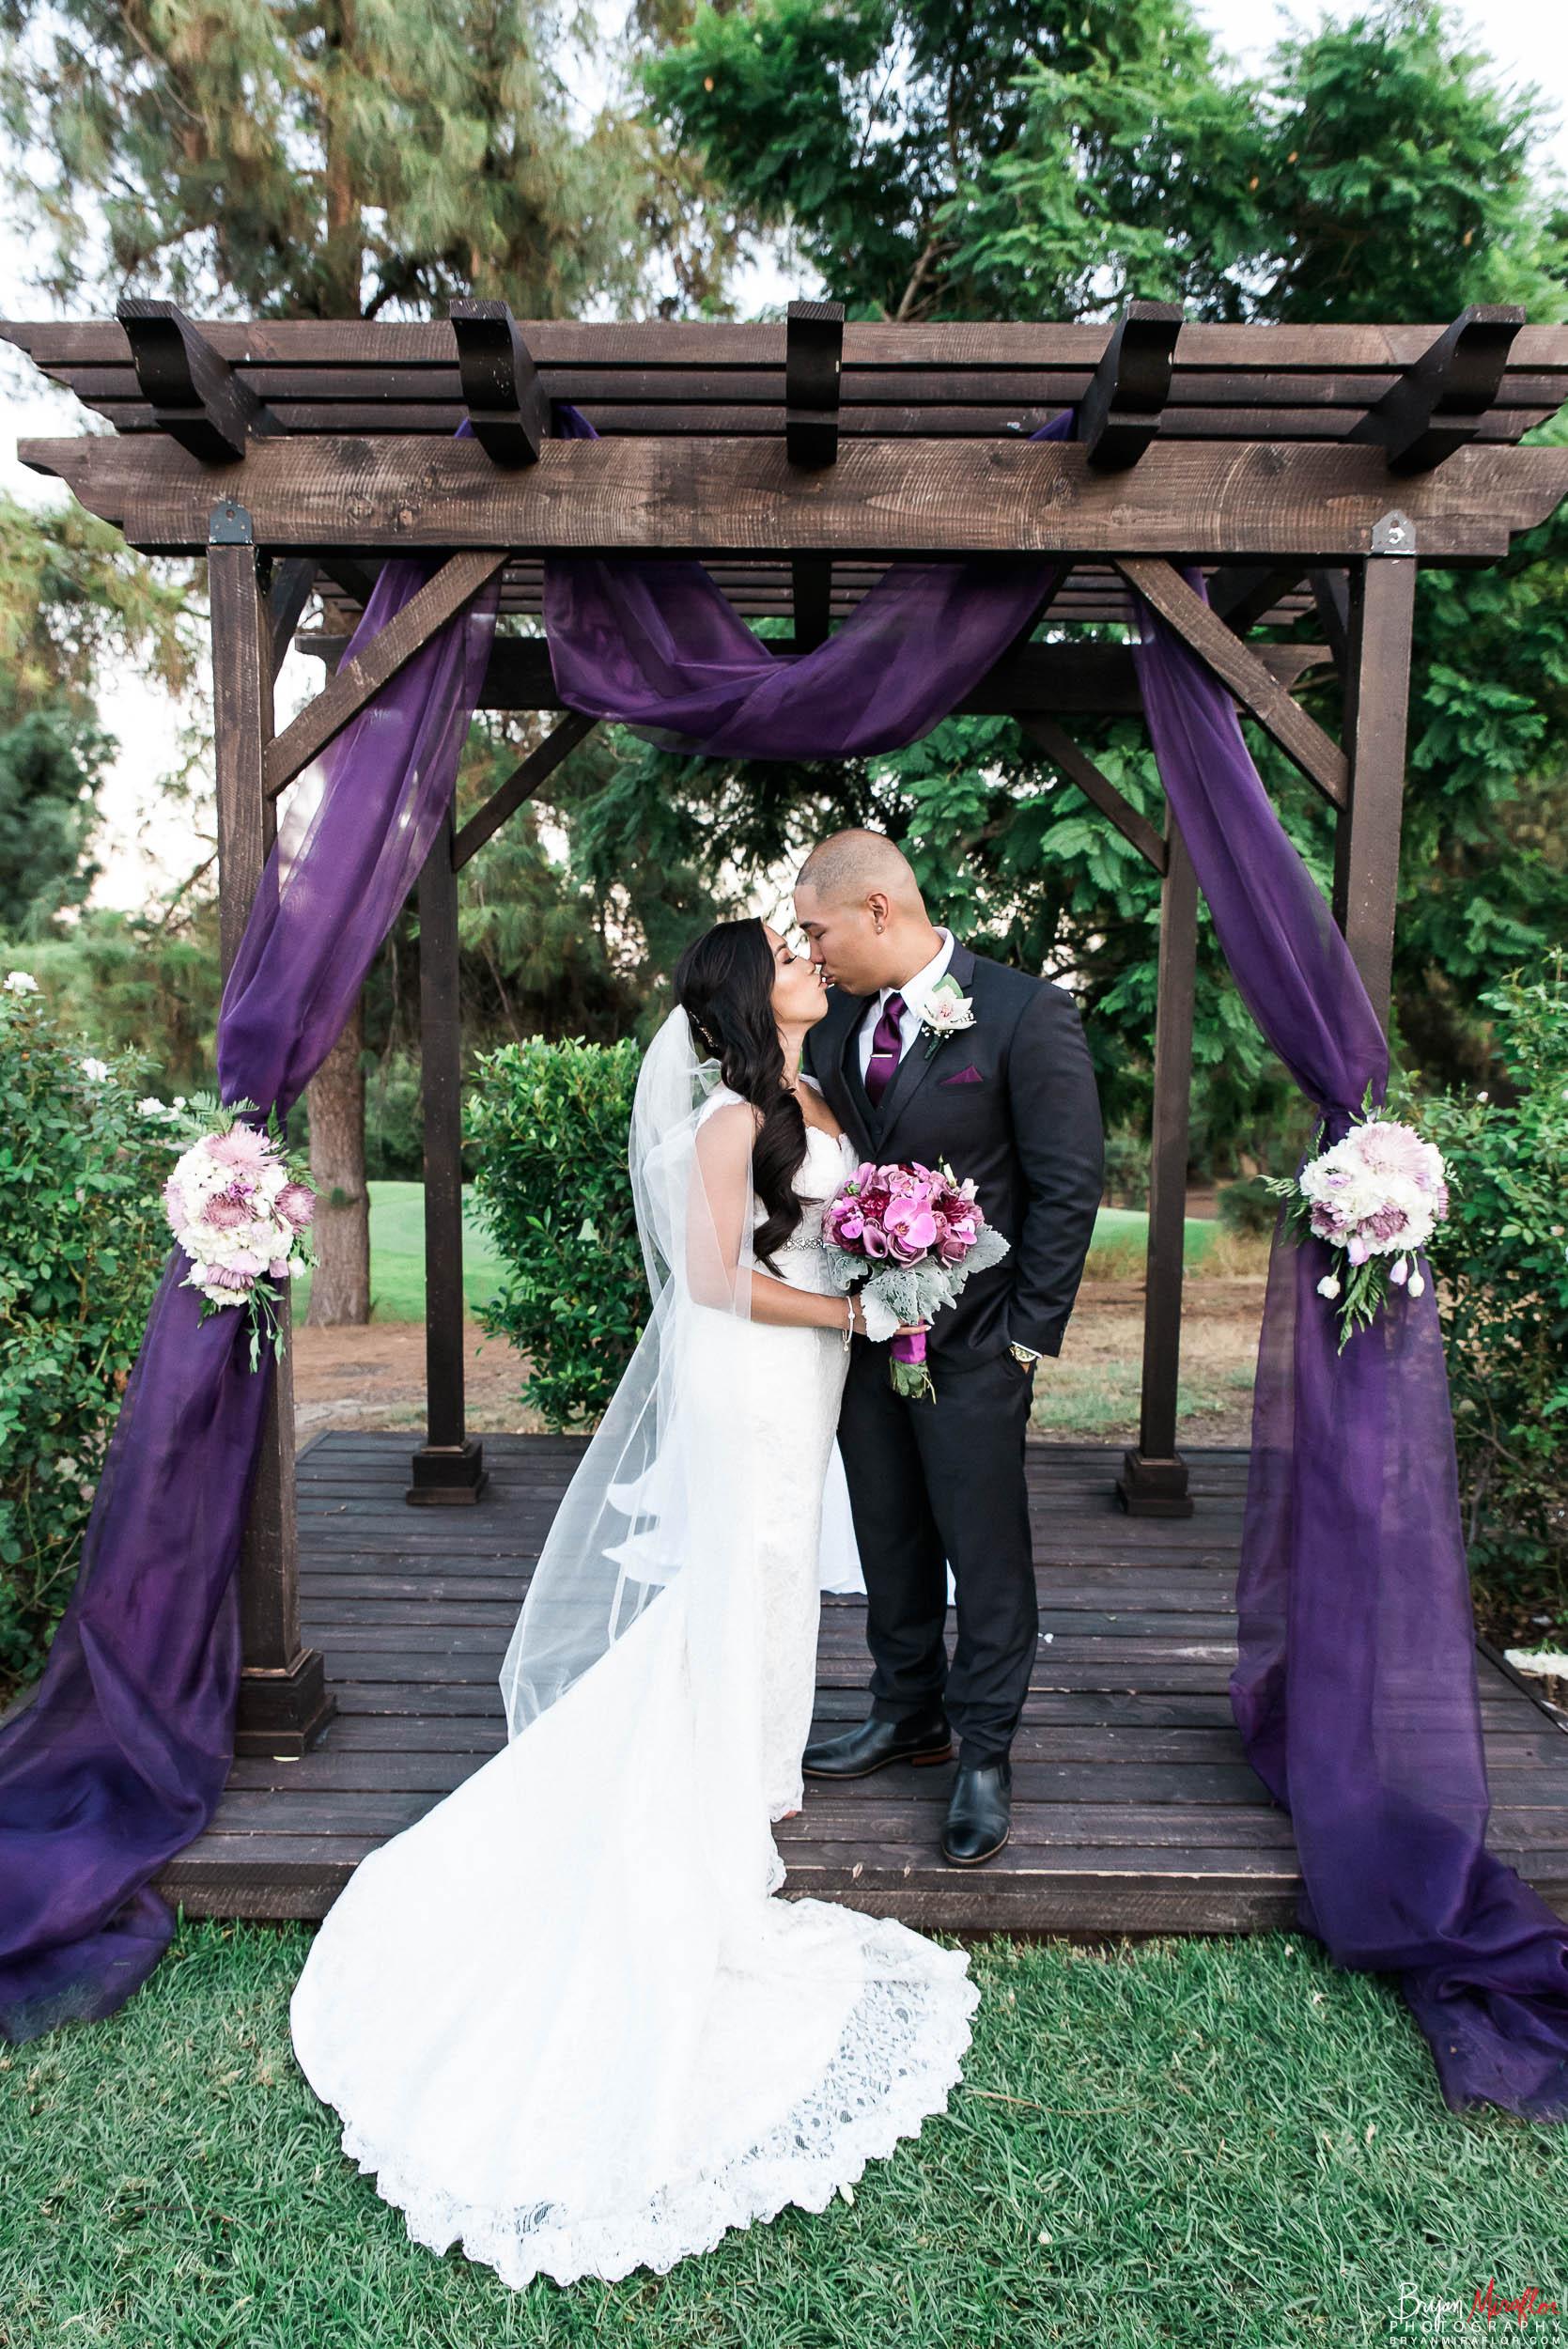 Bryan-Miraflor-Photography-Trisha-Dexter-Married-20170923-061.jpg